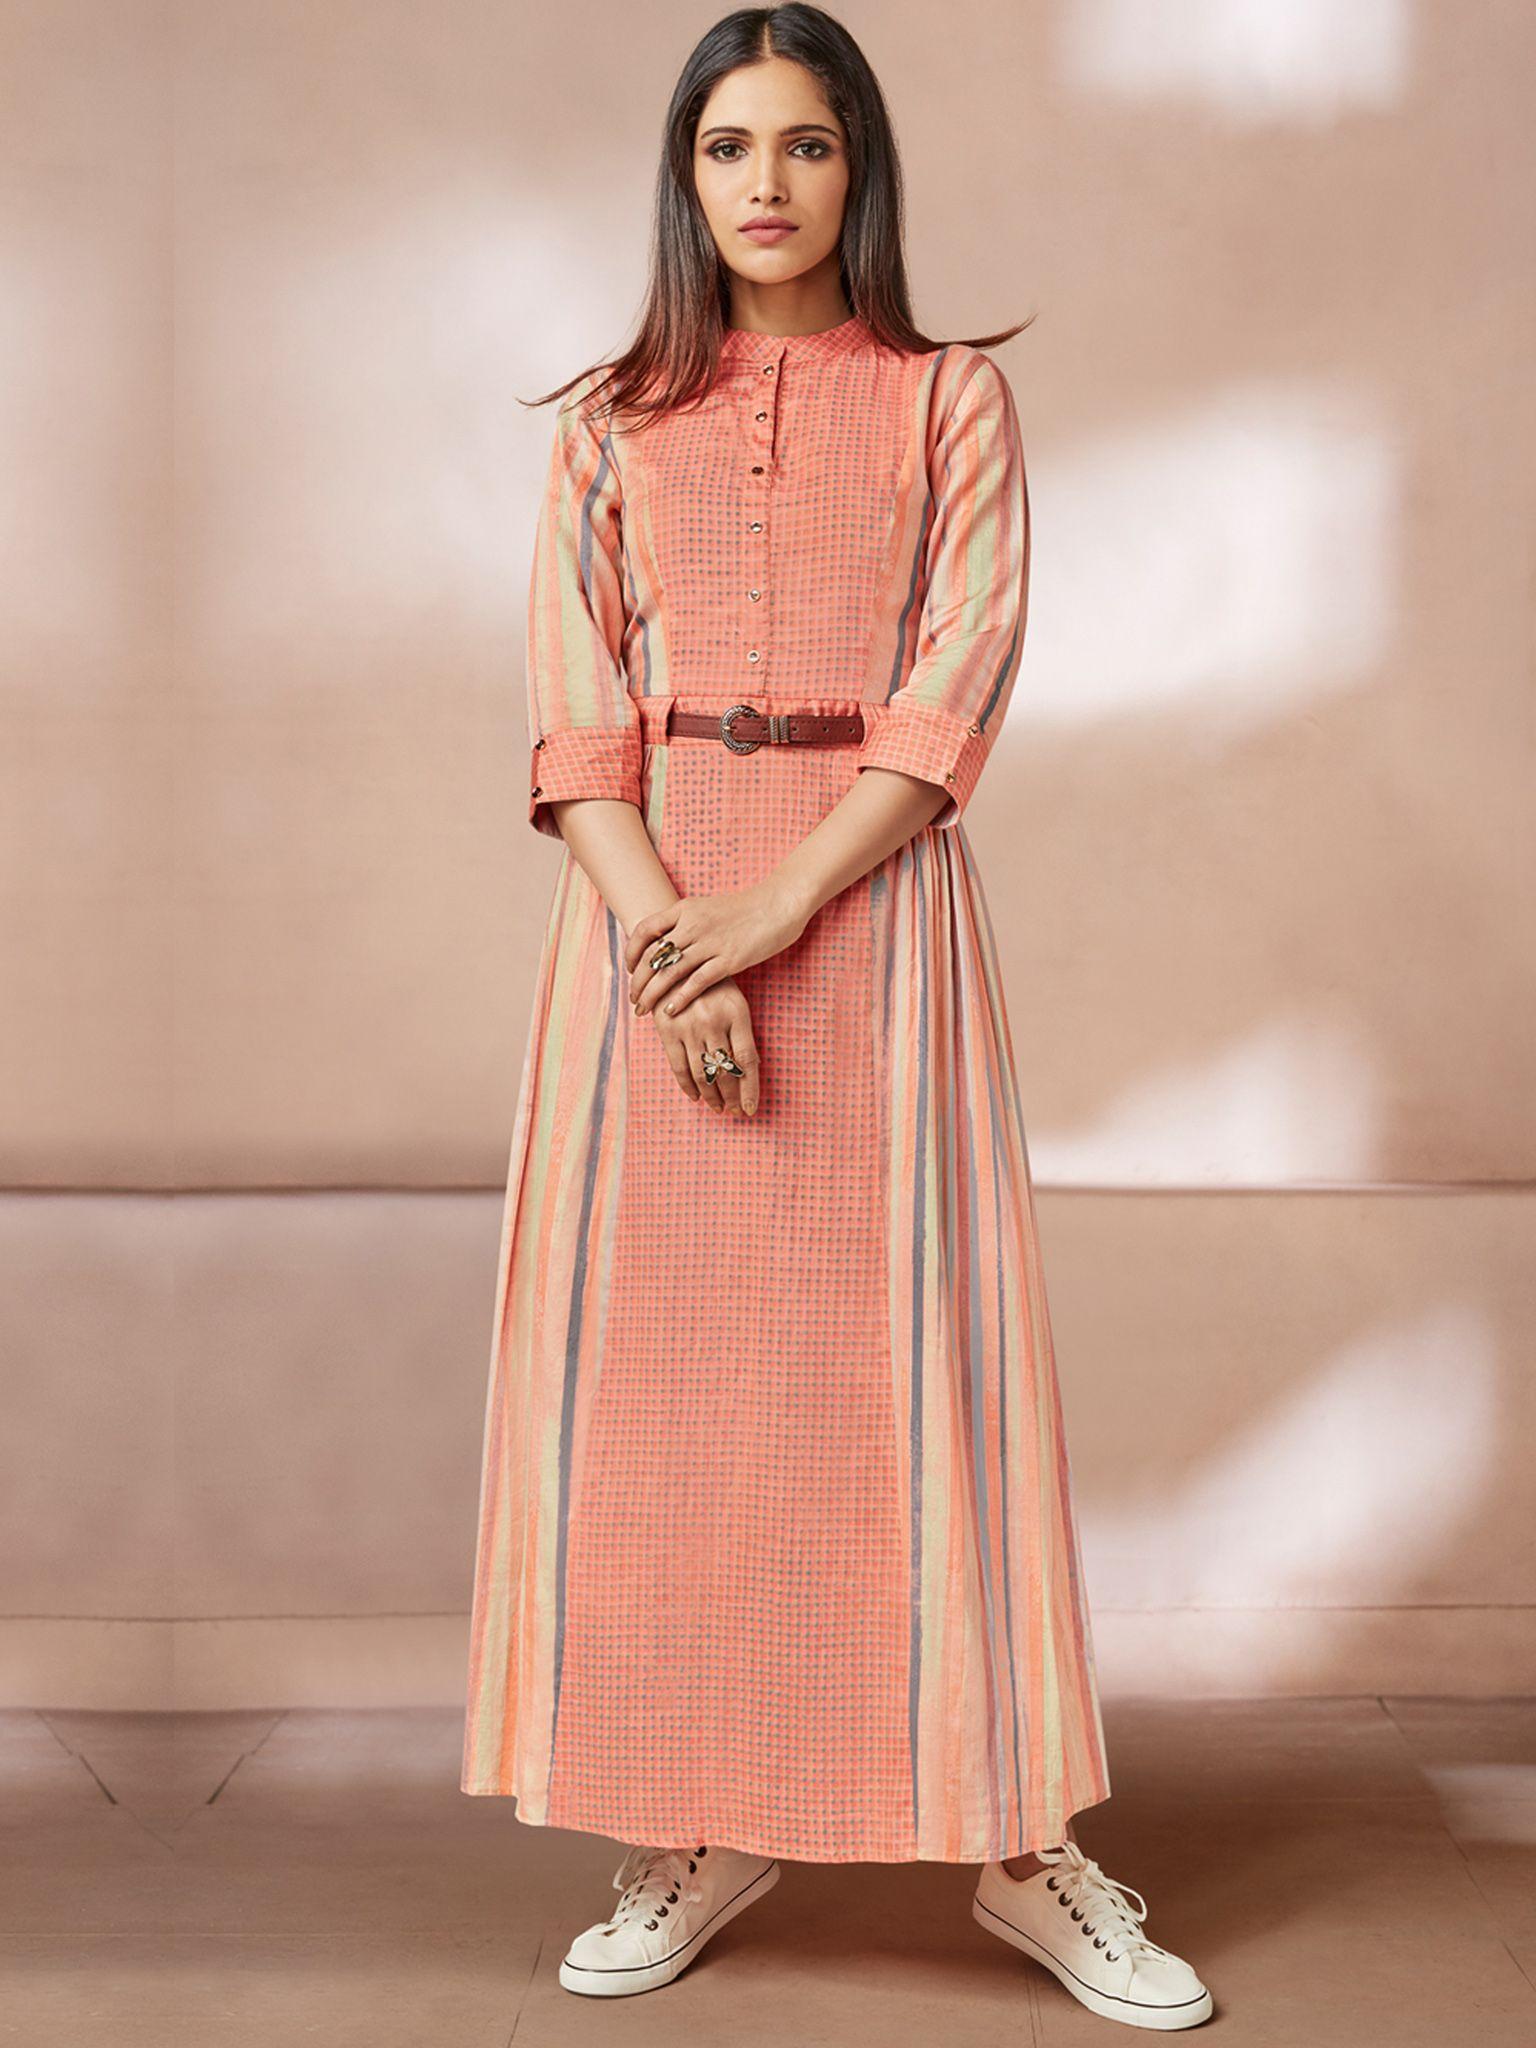 b596c6a33e Peach Color Rayon Fabric Fancy Kurti | Vastravibe in 2019 | Fancy ...